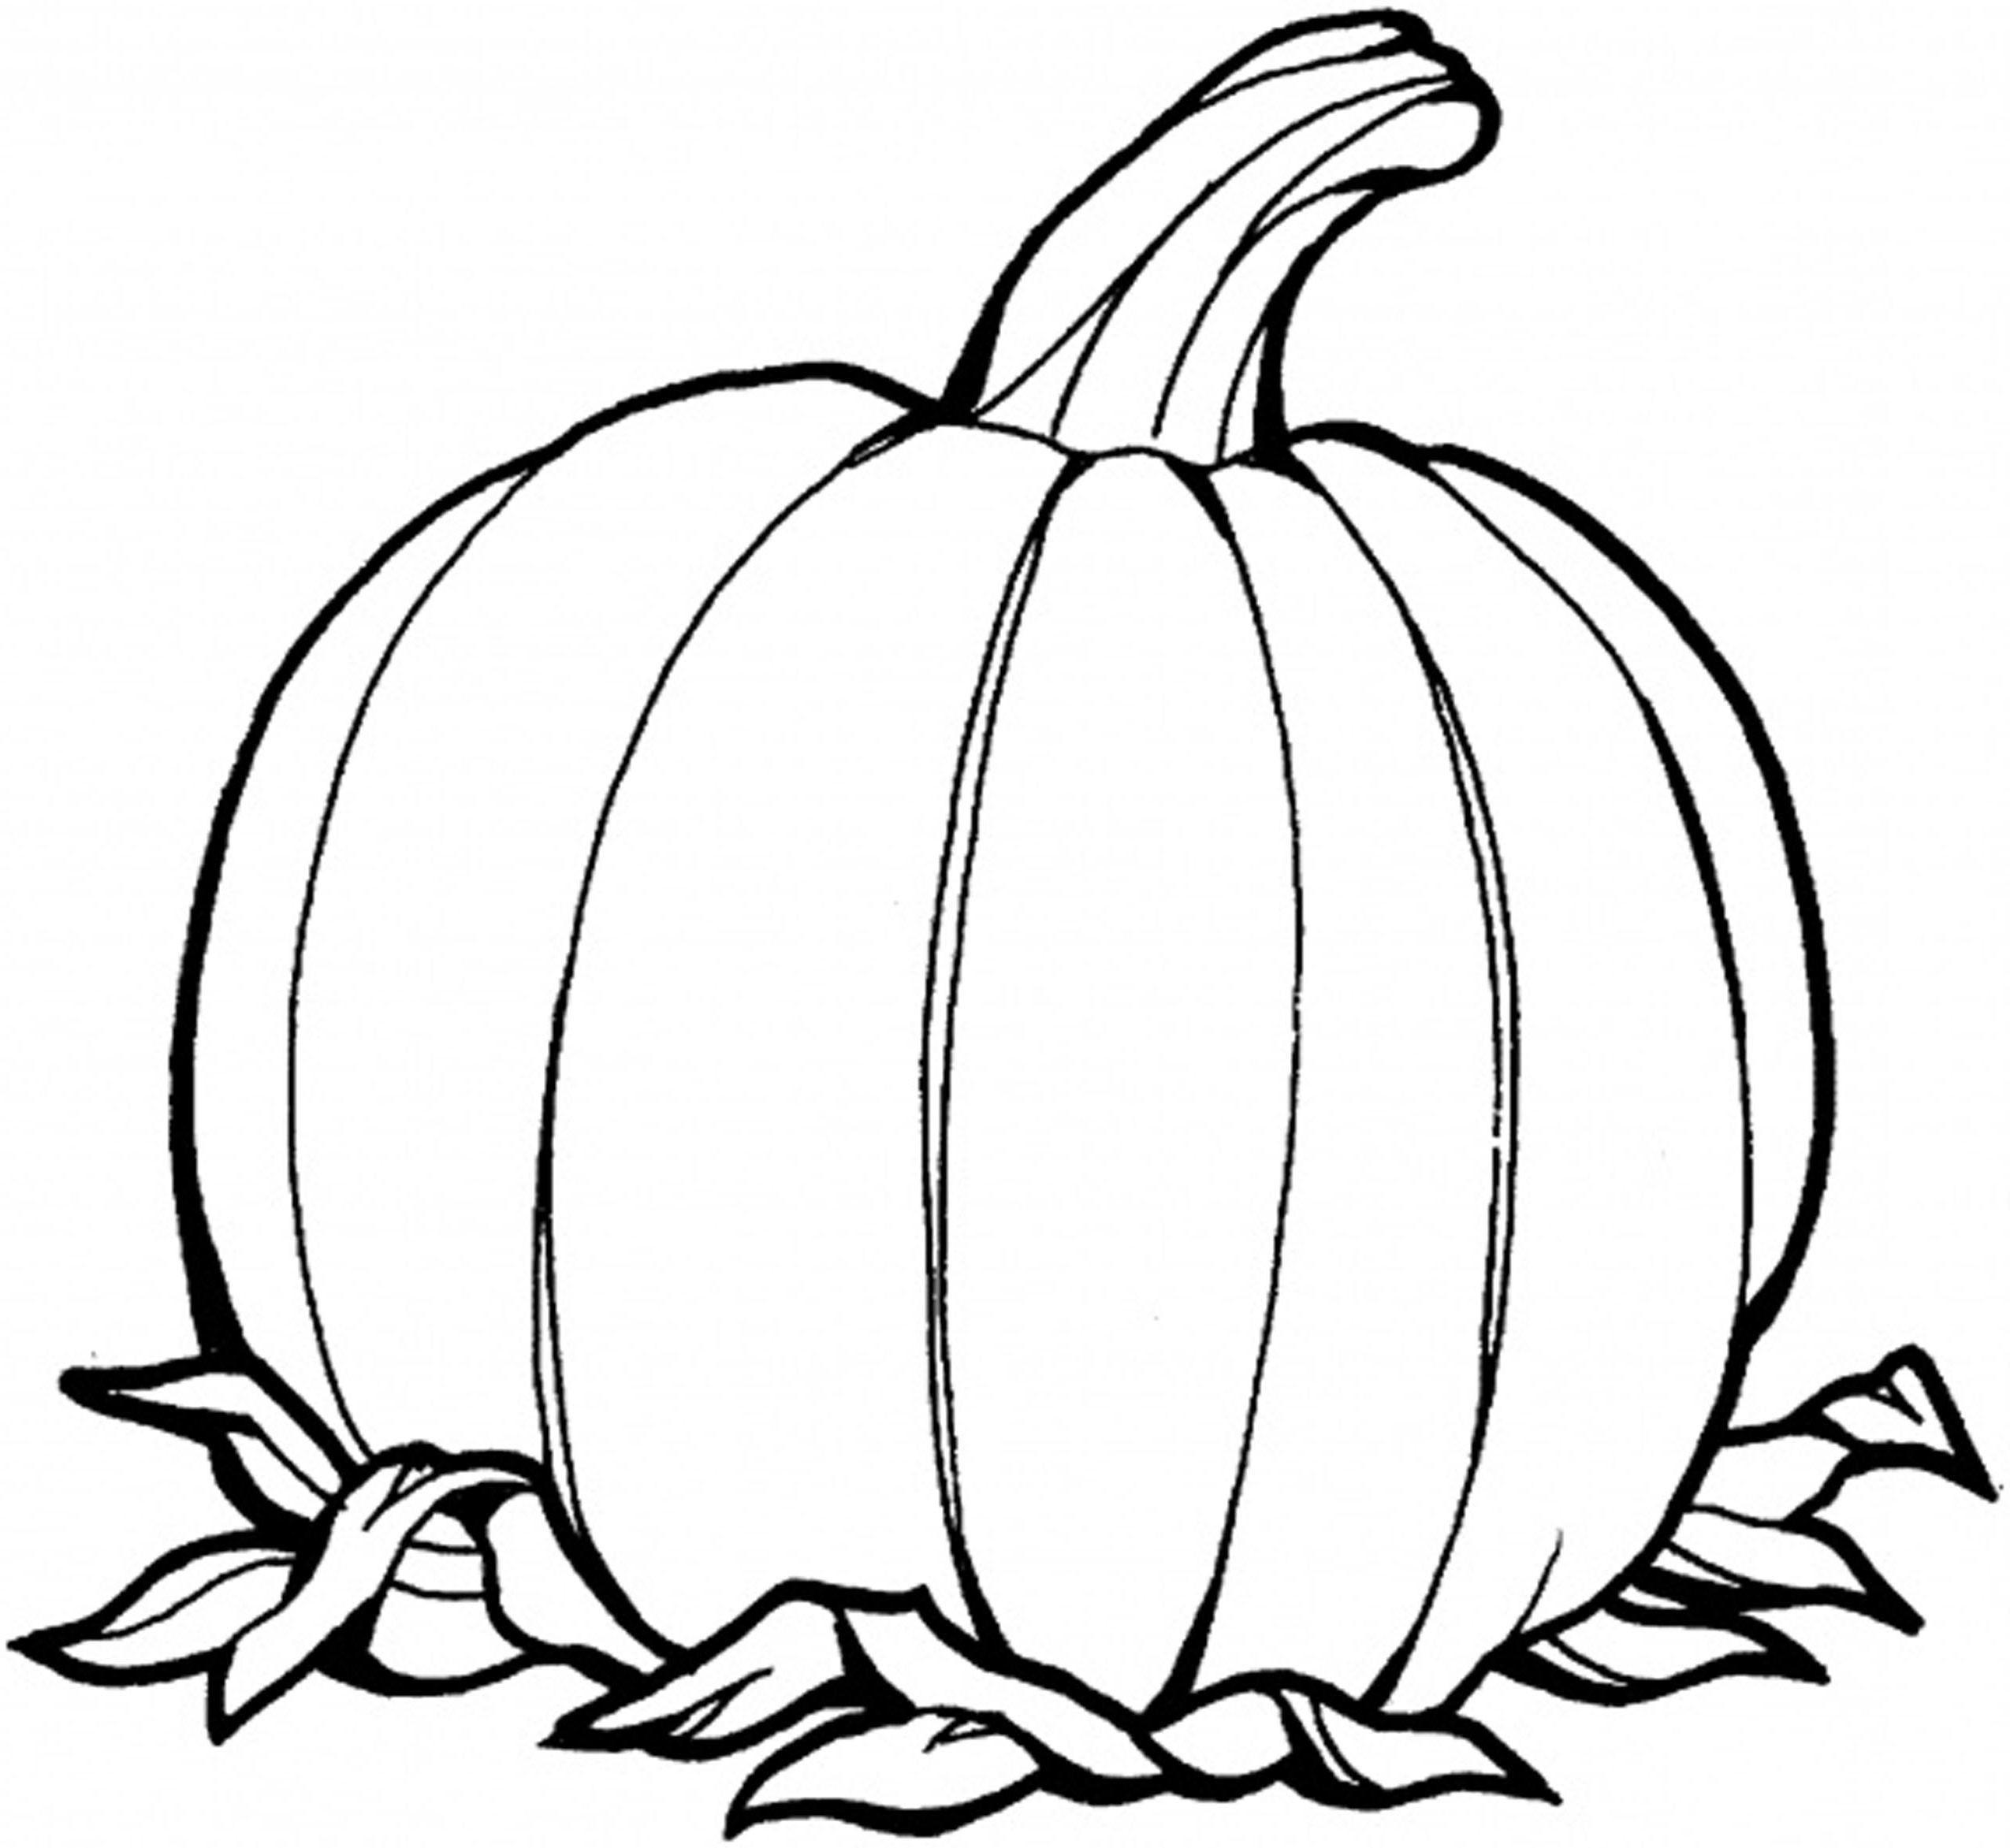 Pumpkin Coloring Pages Printables at GetDrawings.com | Free ...